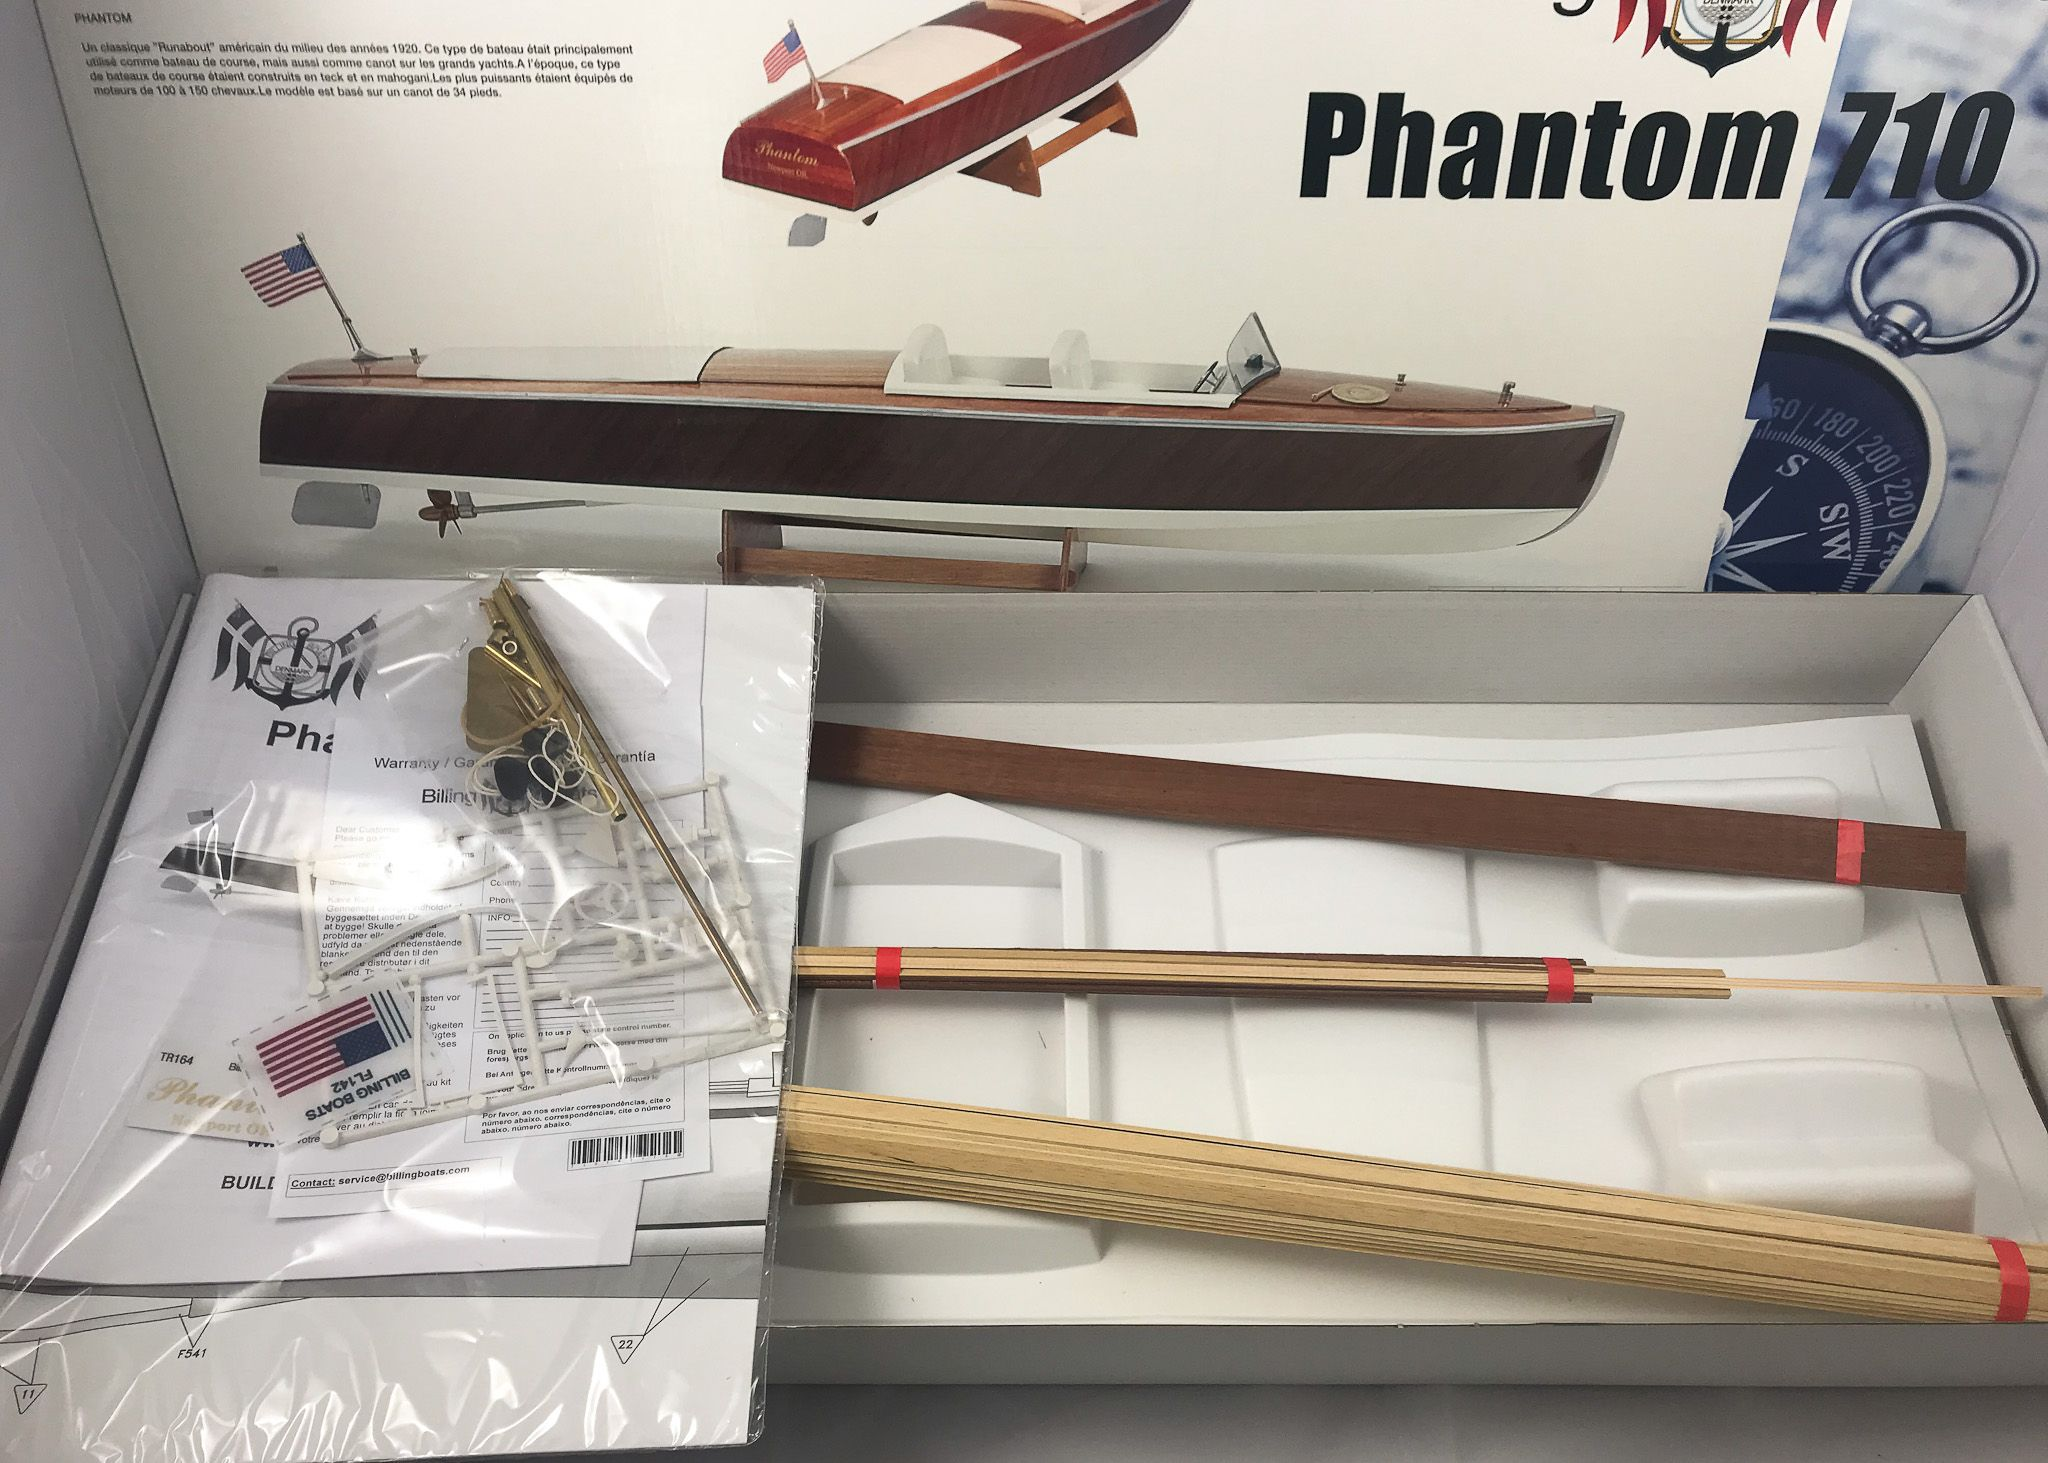 Phantom Runabout Model Boat Kit - Billing Boats (B710)